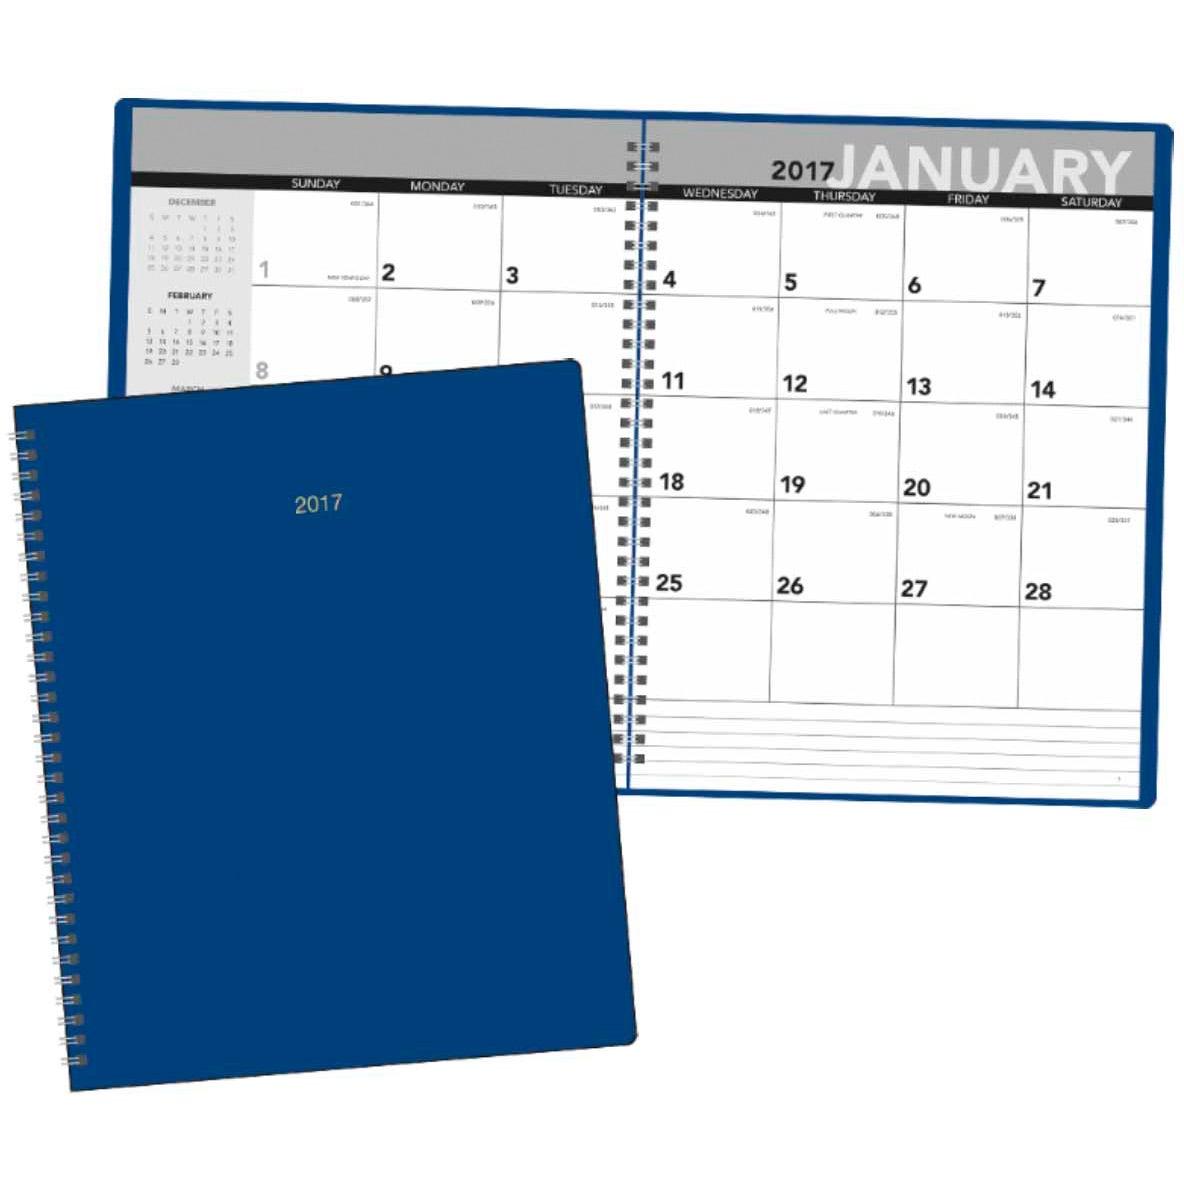 Monthly planner 2017 custom day planners ea for Custom photo planner